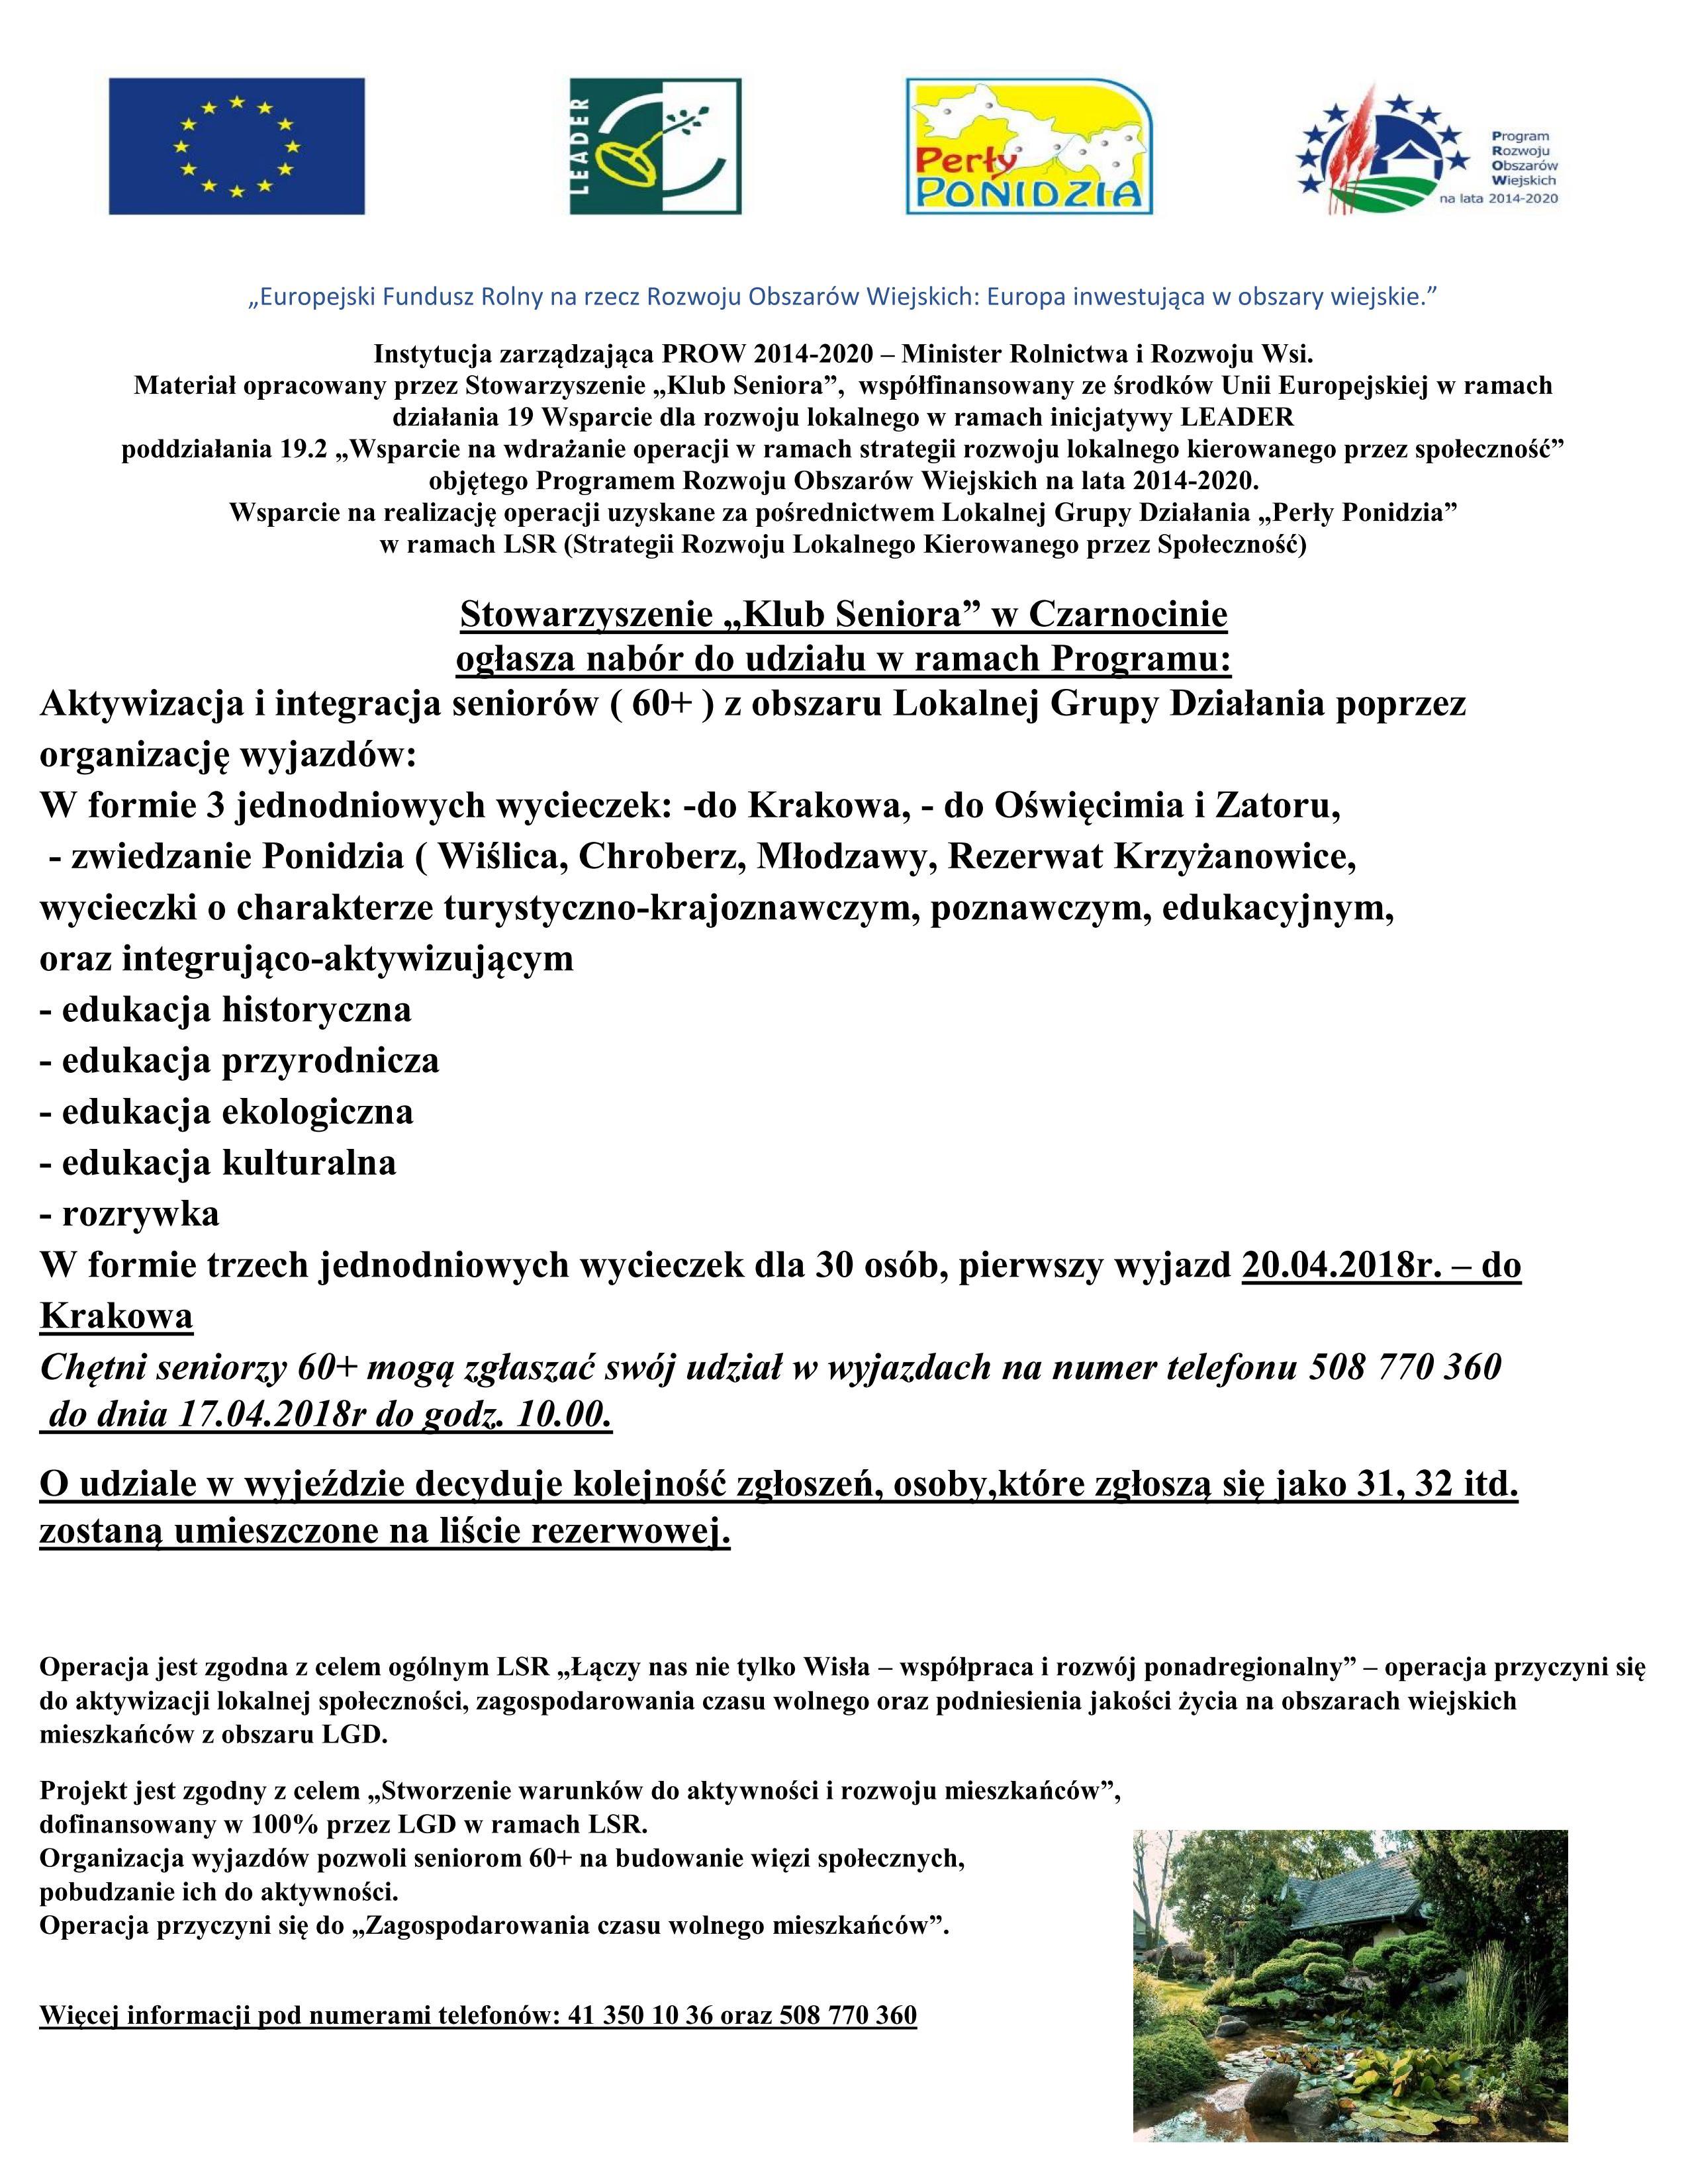 klibseniora12018.jpg